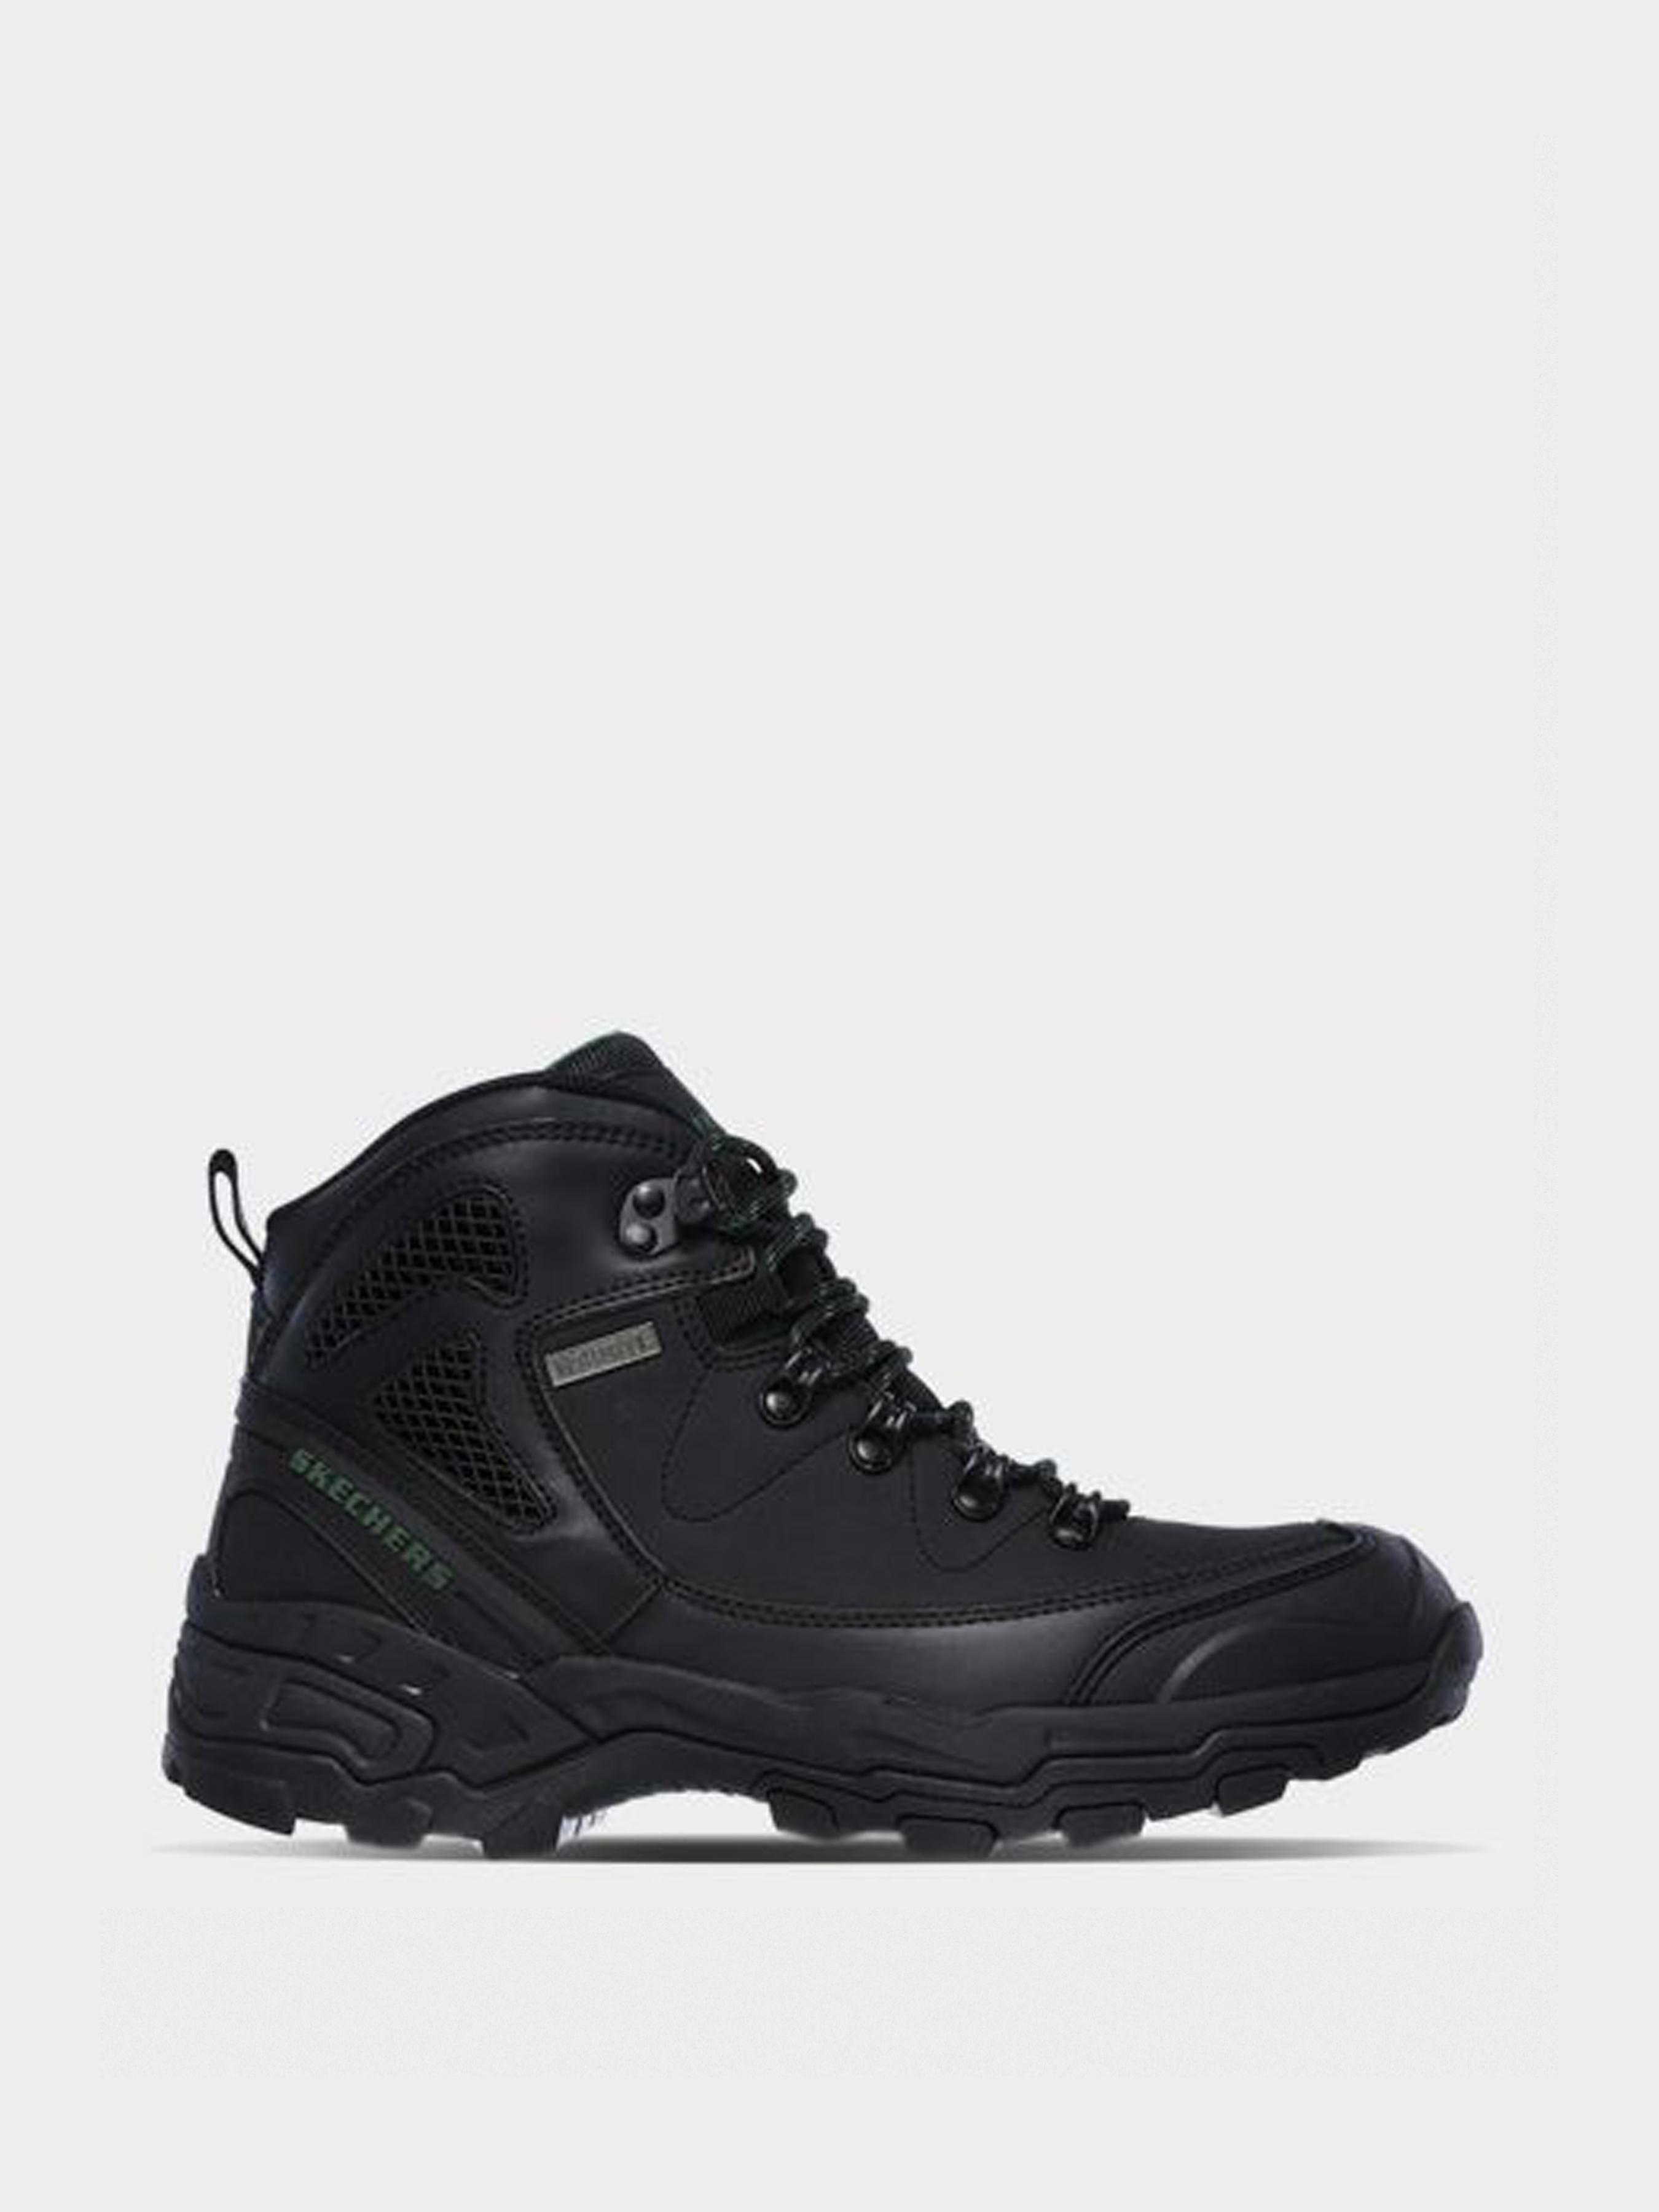 Ботинки для мужчин Skechers KM2701 , 2017